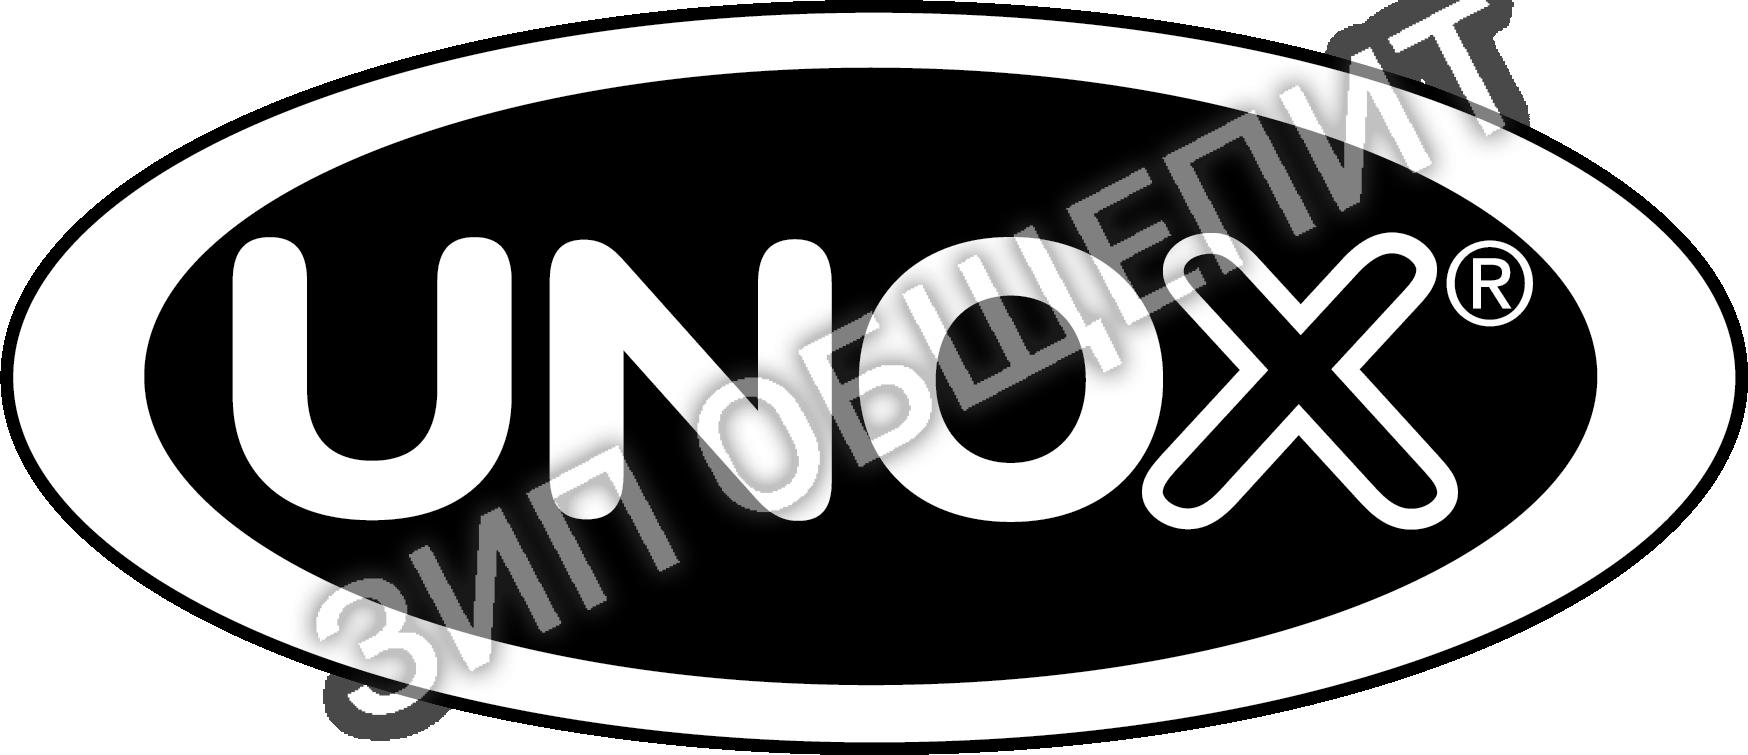 Втулка VM2476A0 для пароконвектомата UNOX модели XEVC-0511-E1R